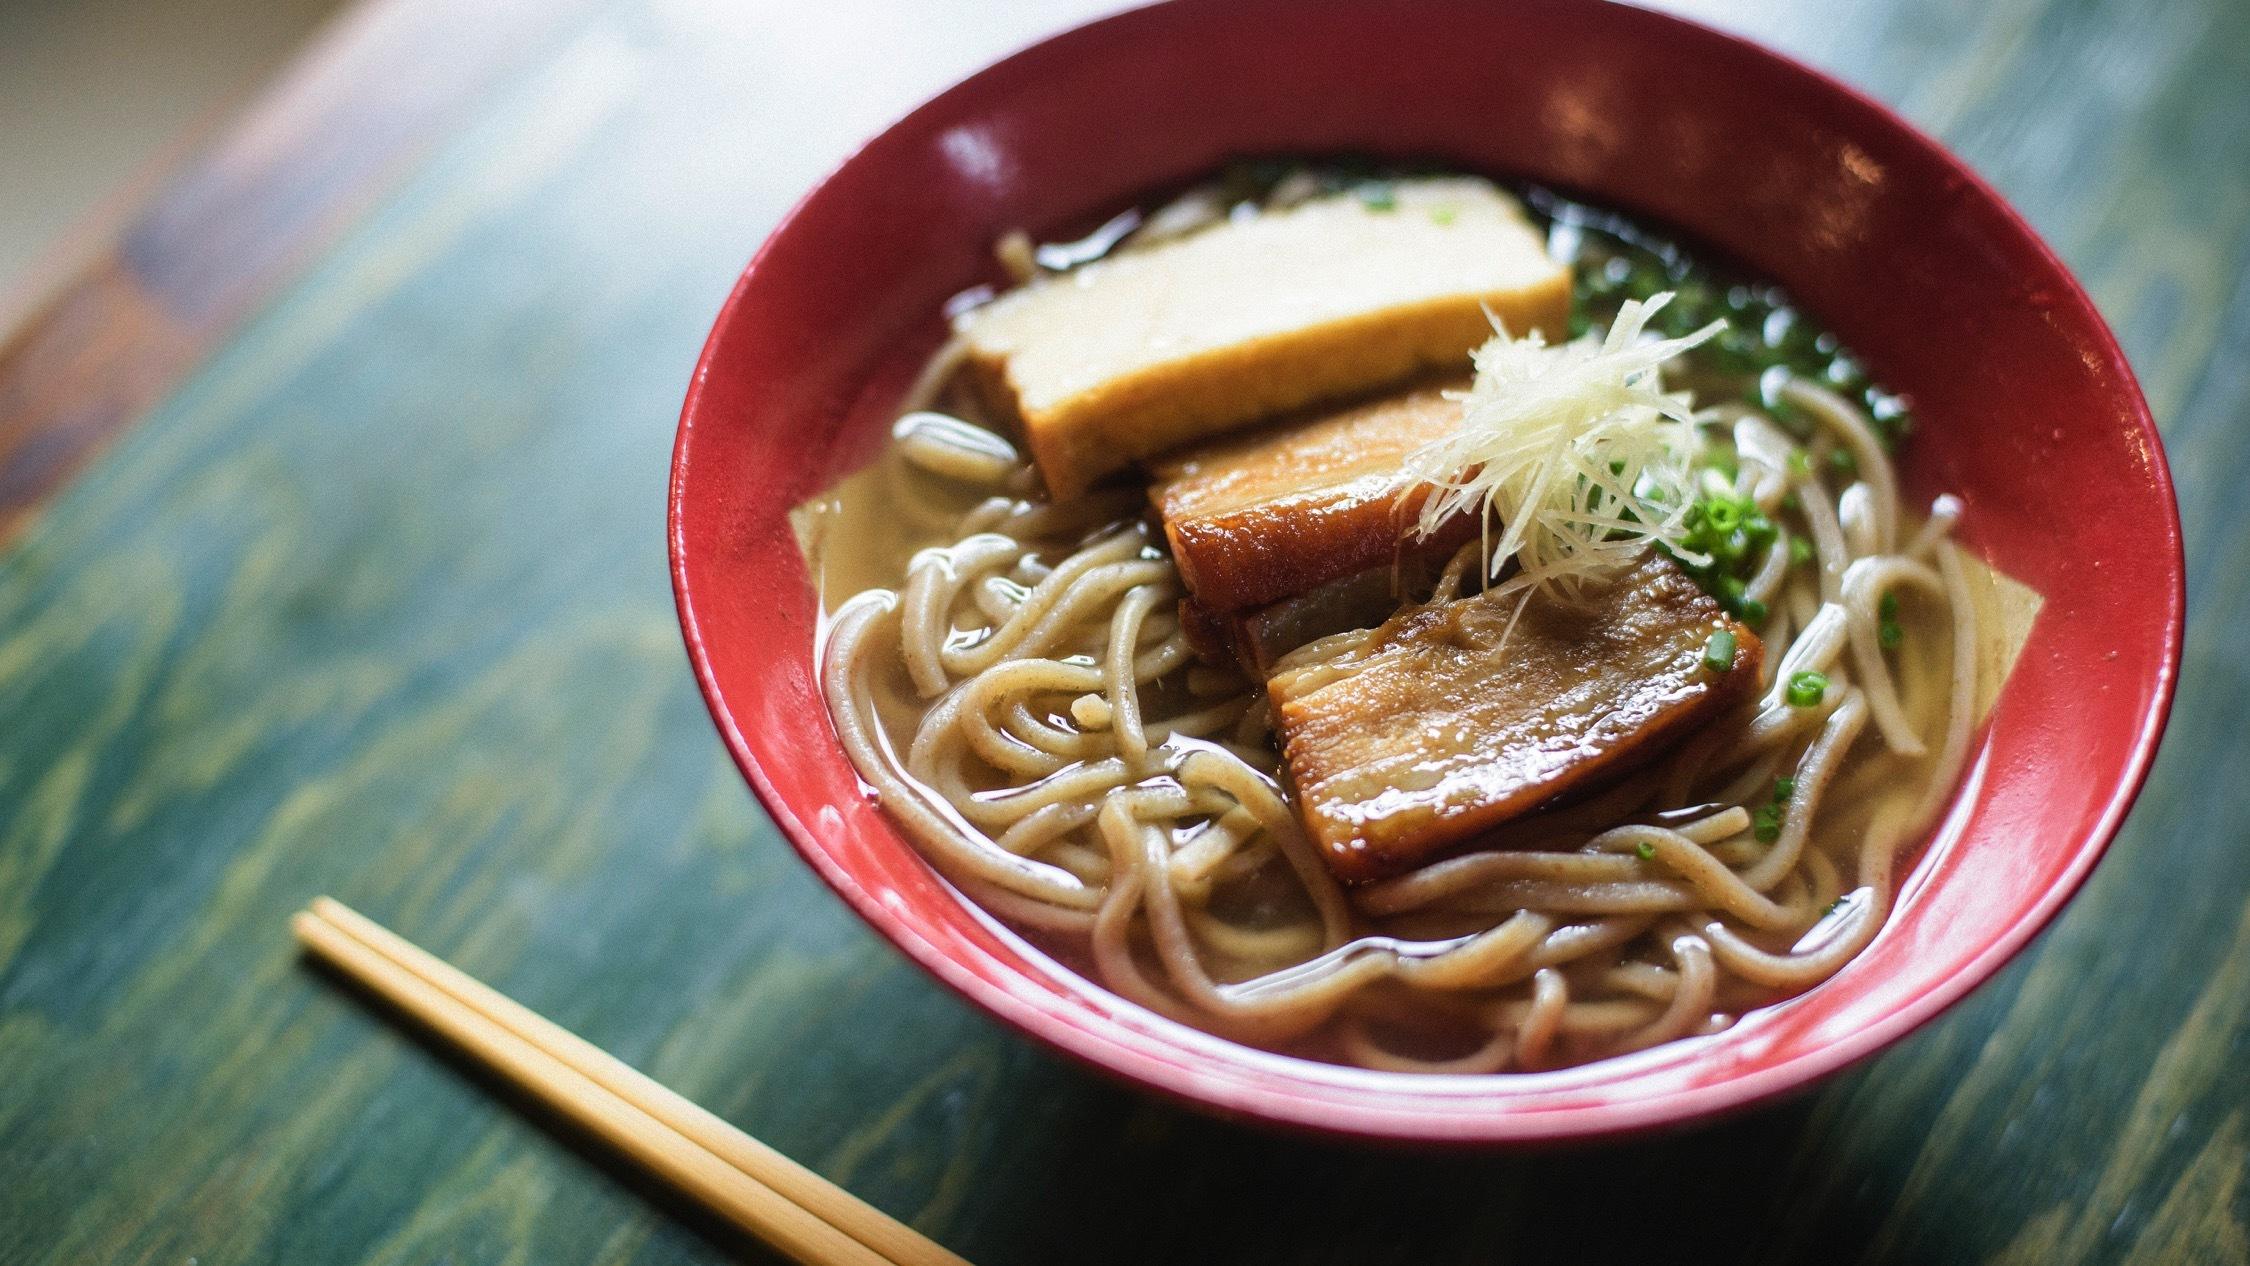 Okinawa's most popular noodle dish Okinawan soba